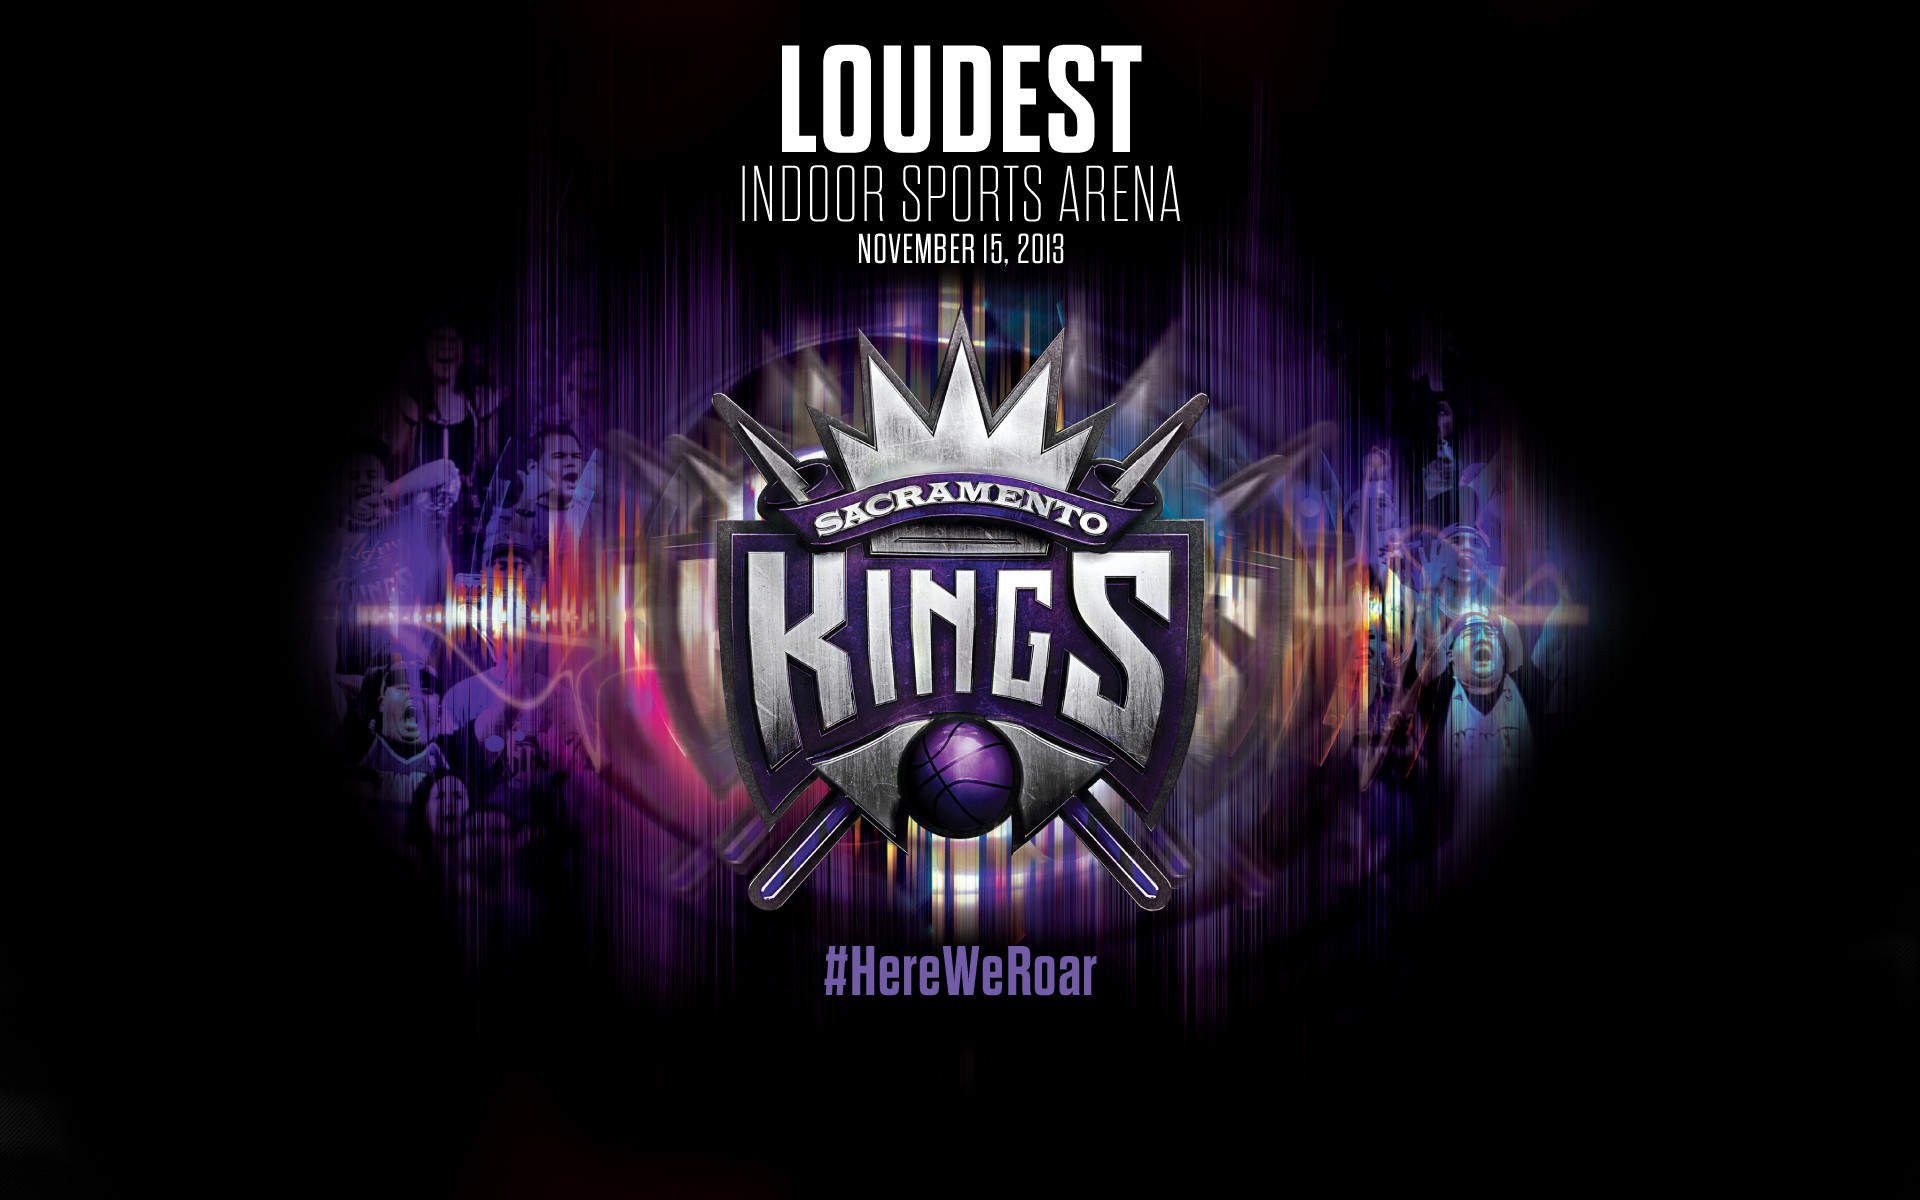 Sacramento Kings | Loudest Indoor Sports Arena